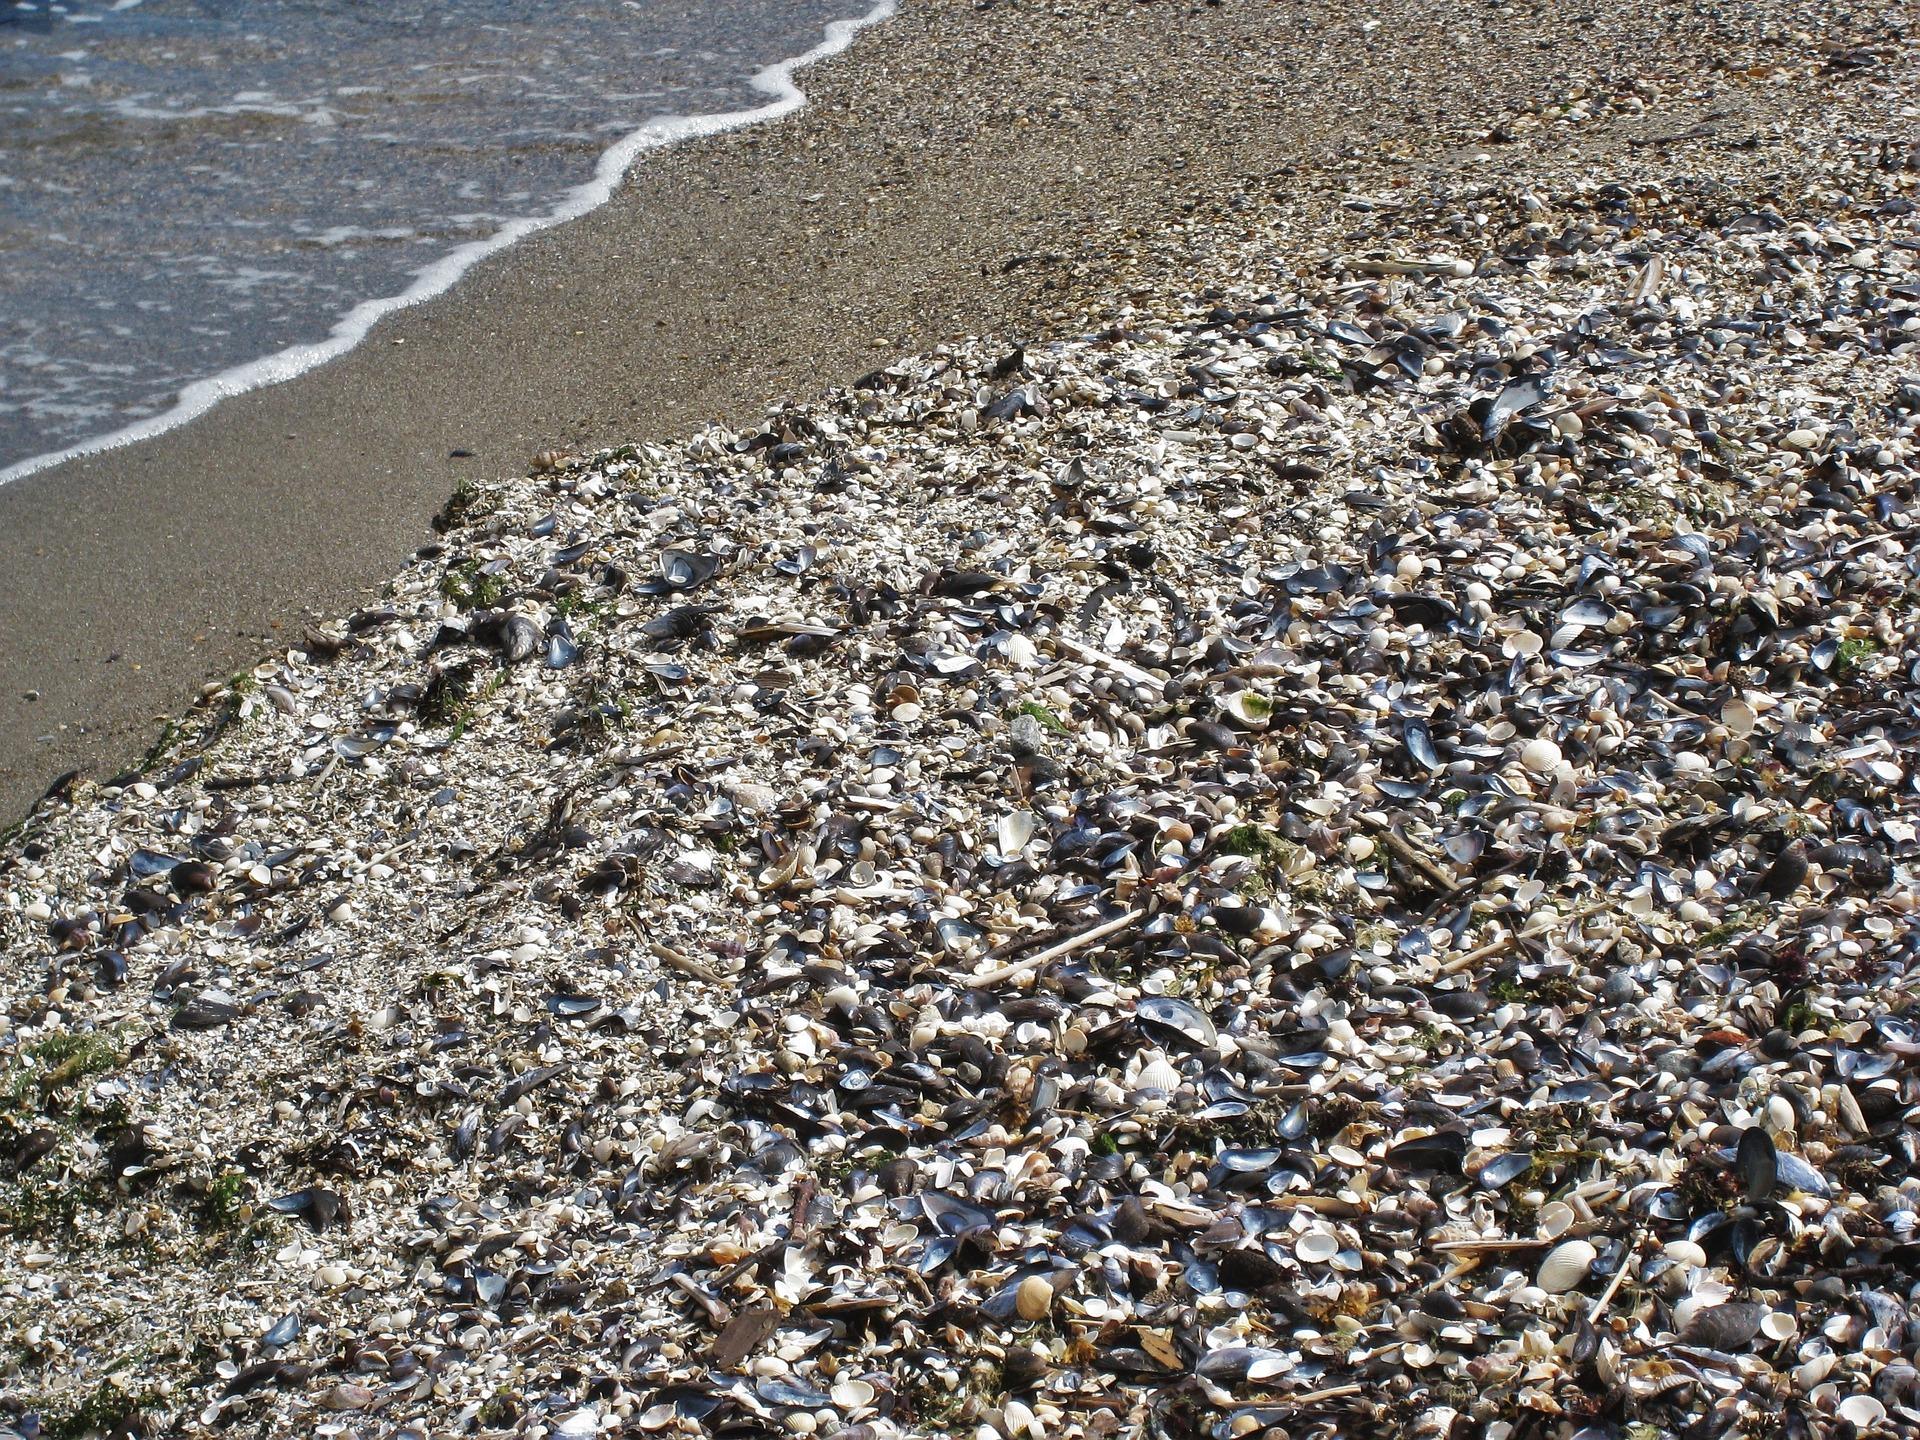 shell-beach-1332297_1920